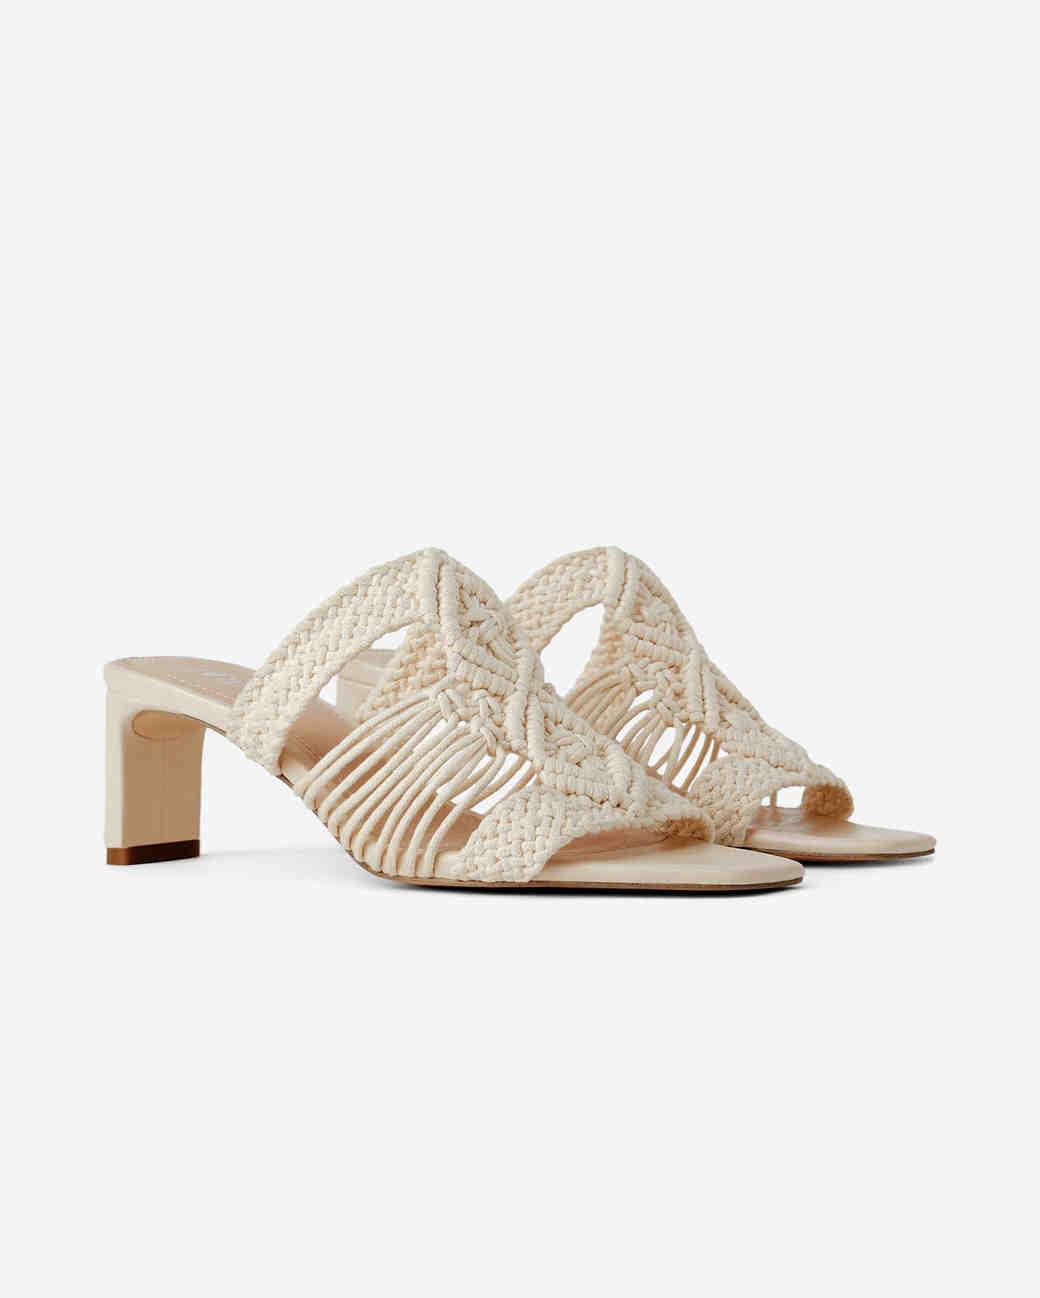 woven sandals bridesmaid shoes